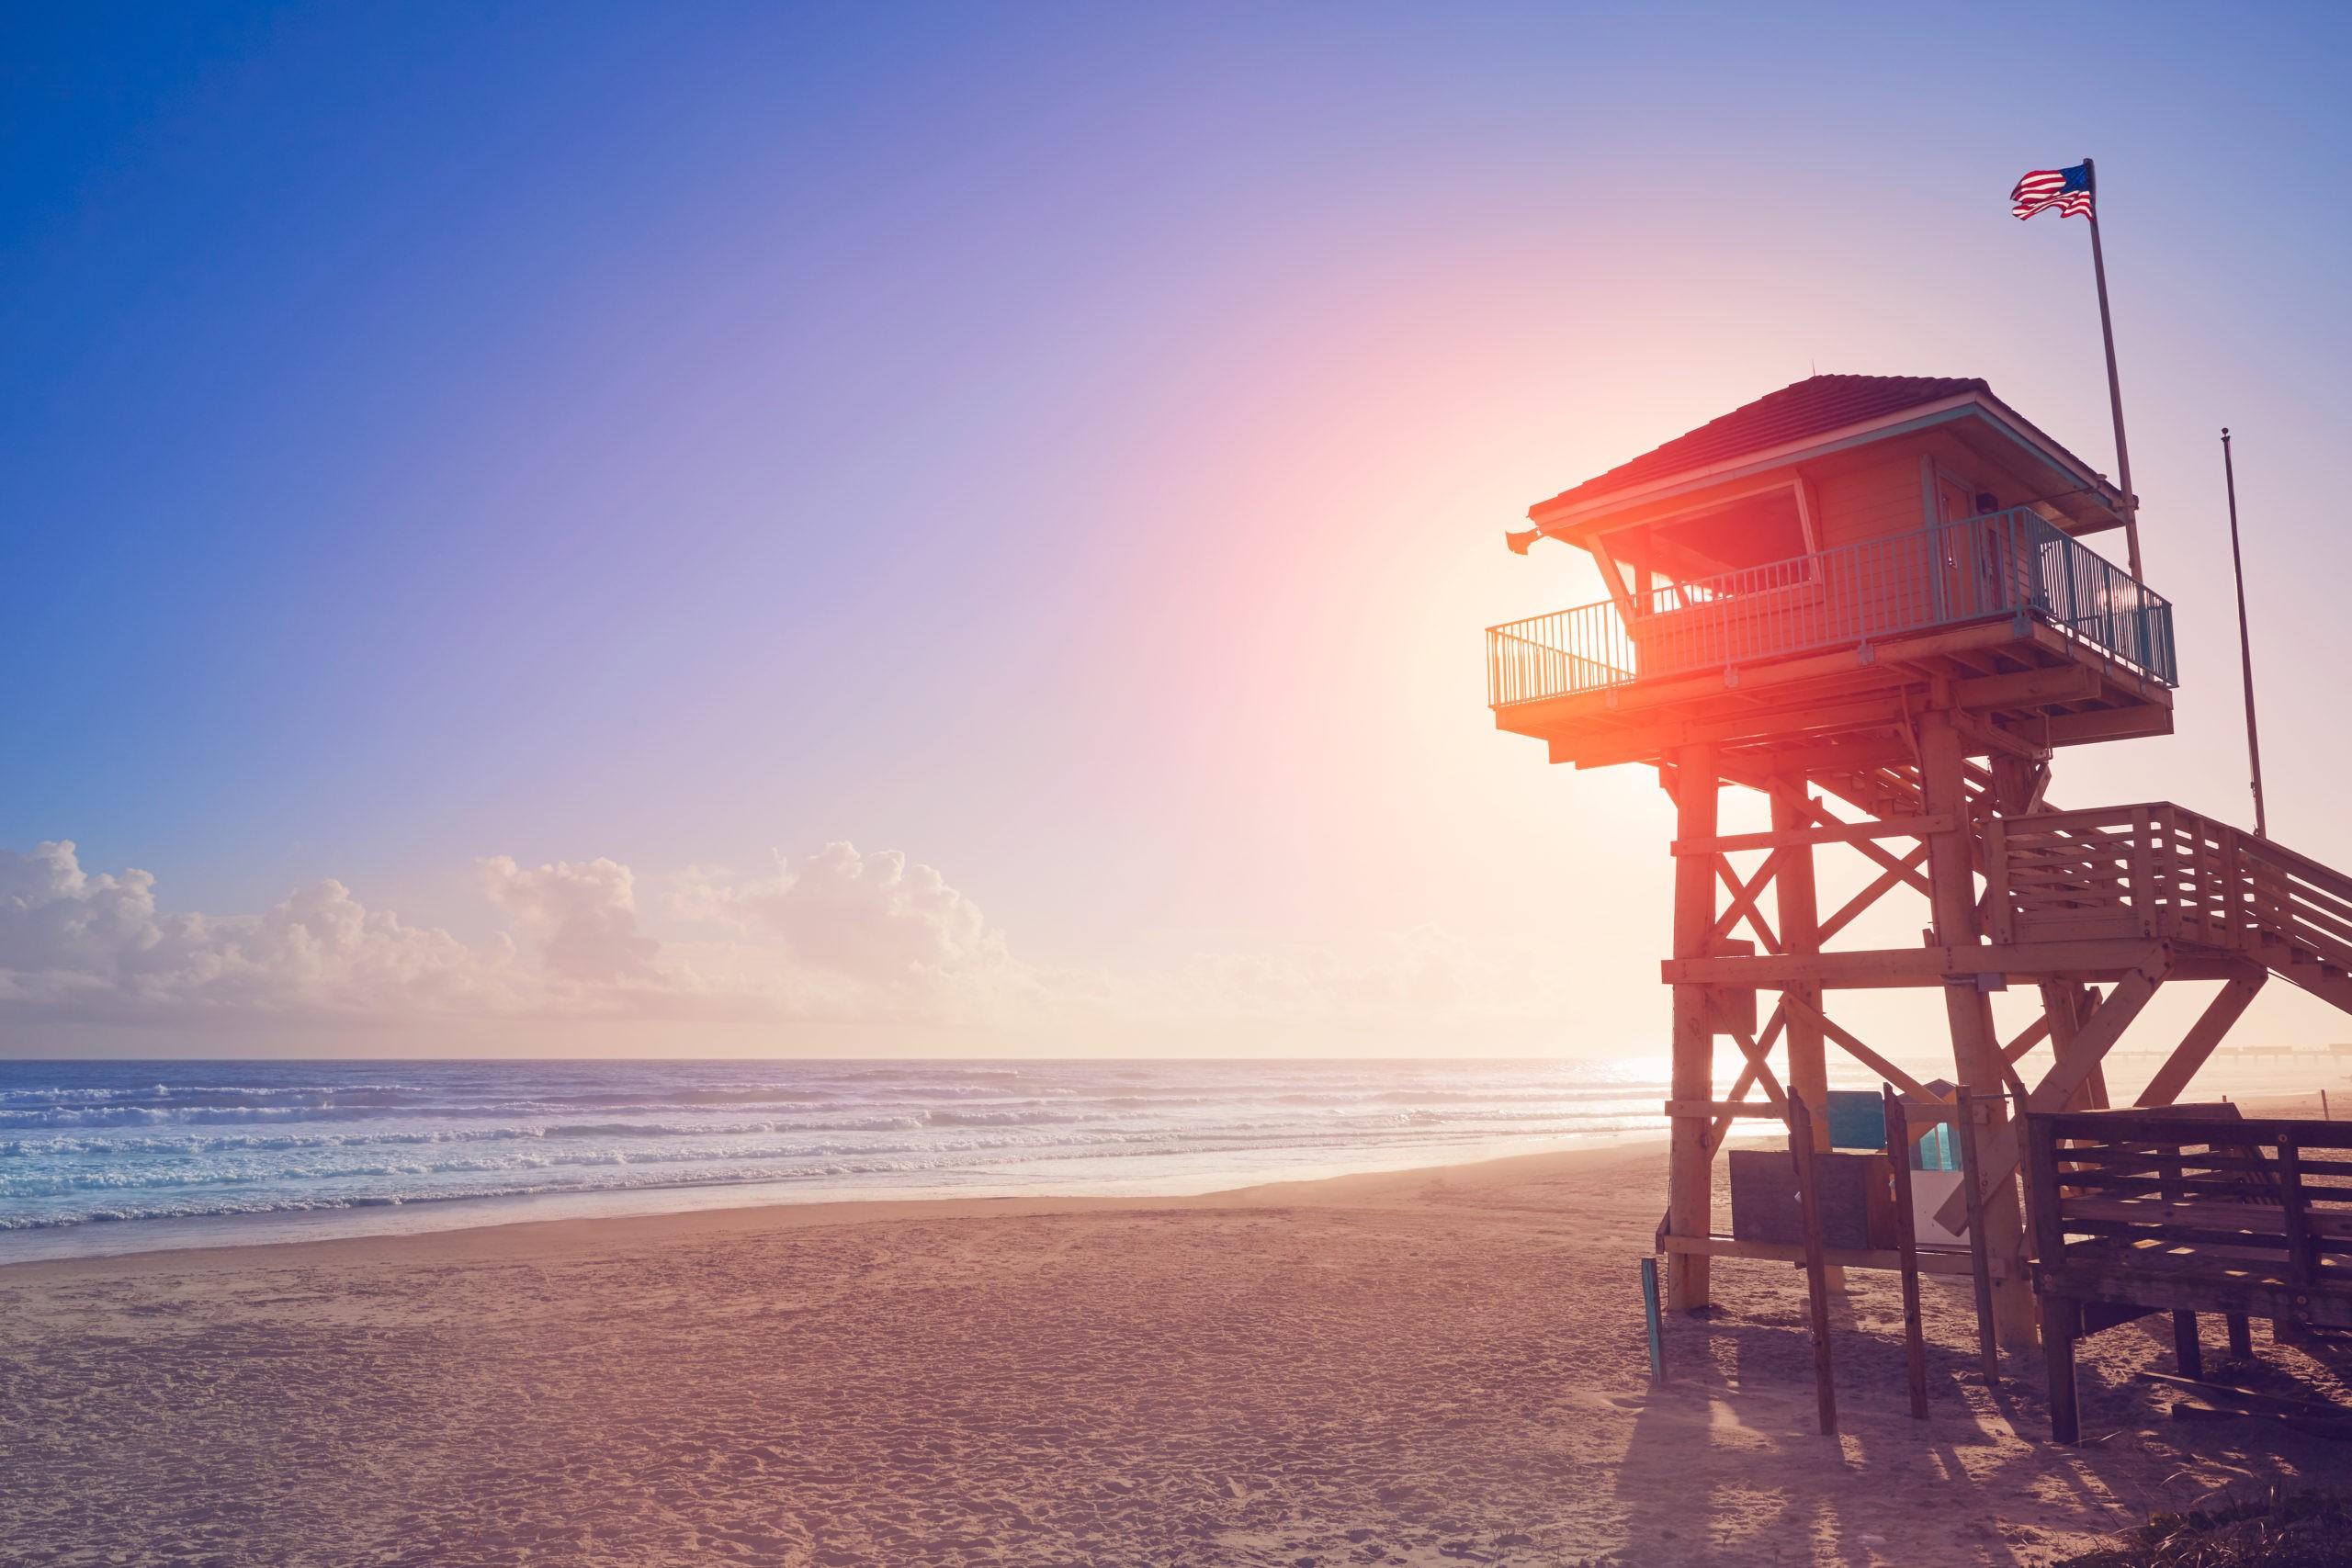 Daytona Beach, licencja: shutterstock/By lunamarina